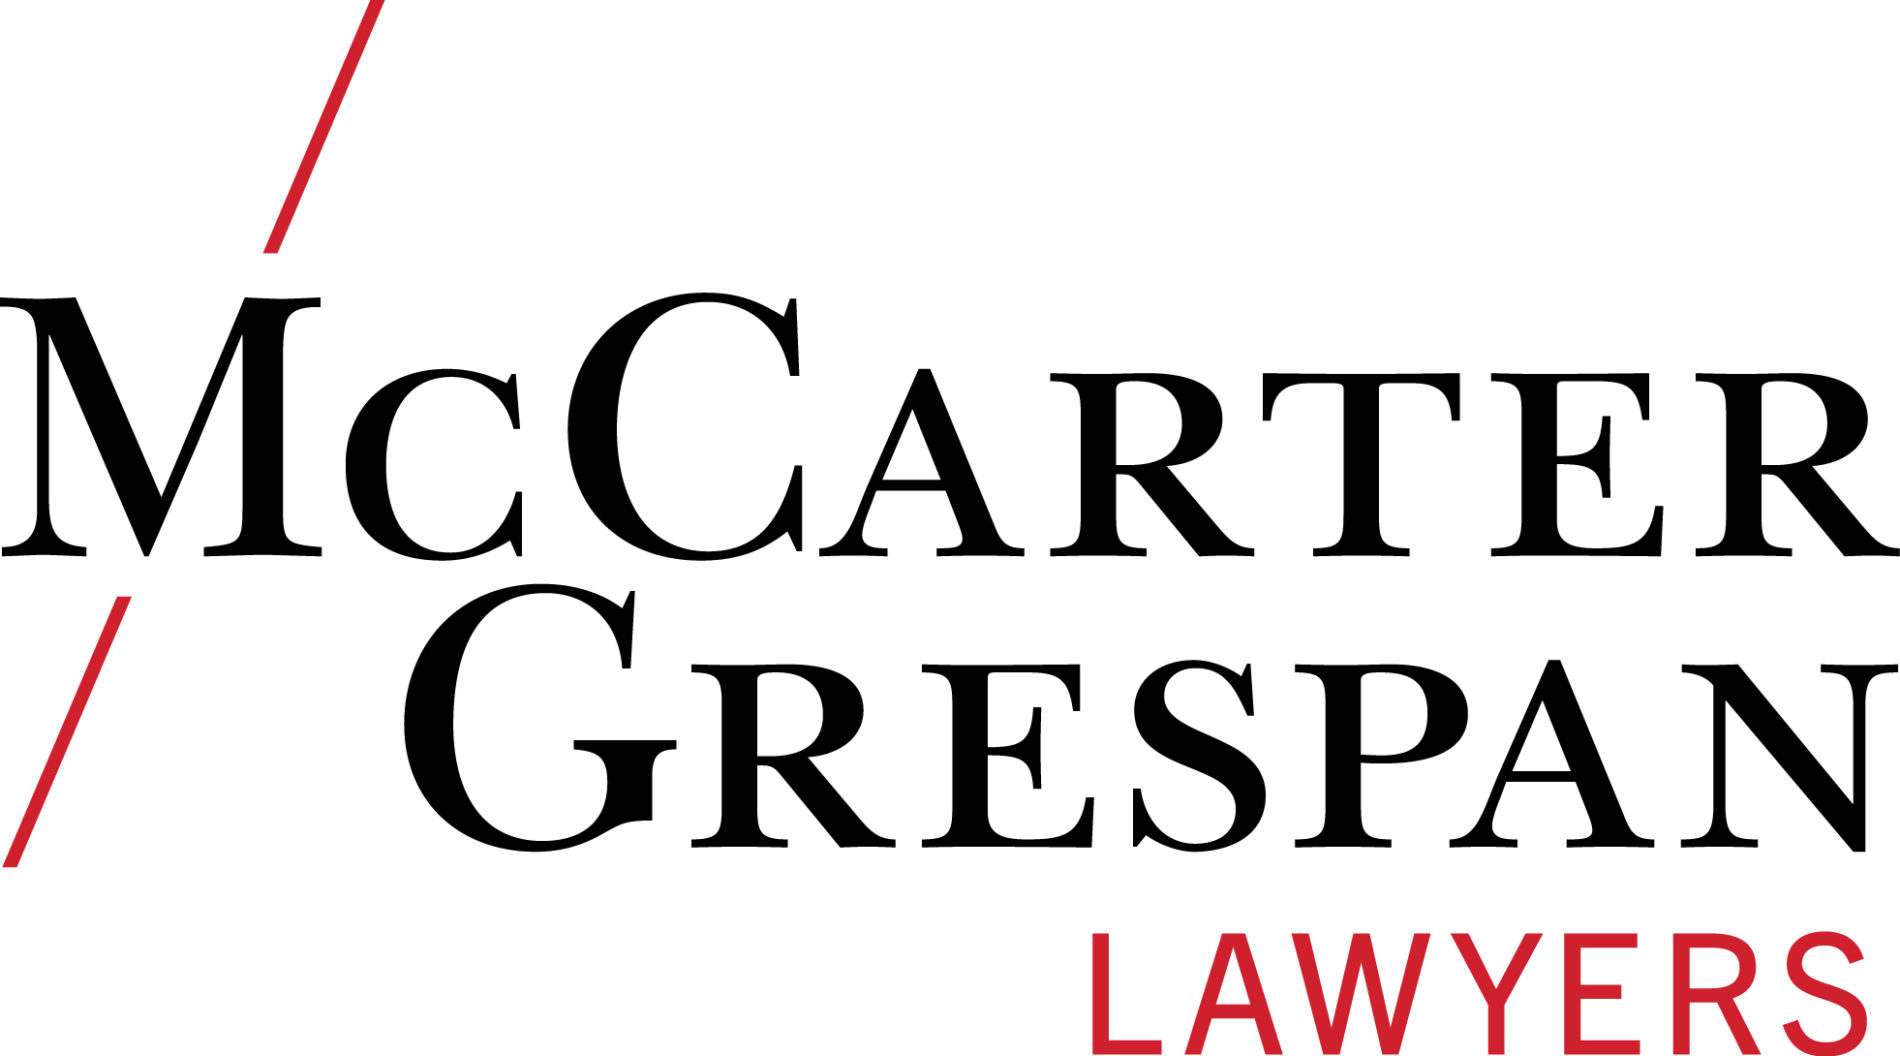 McCarter Grespan